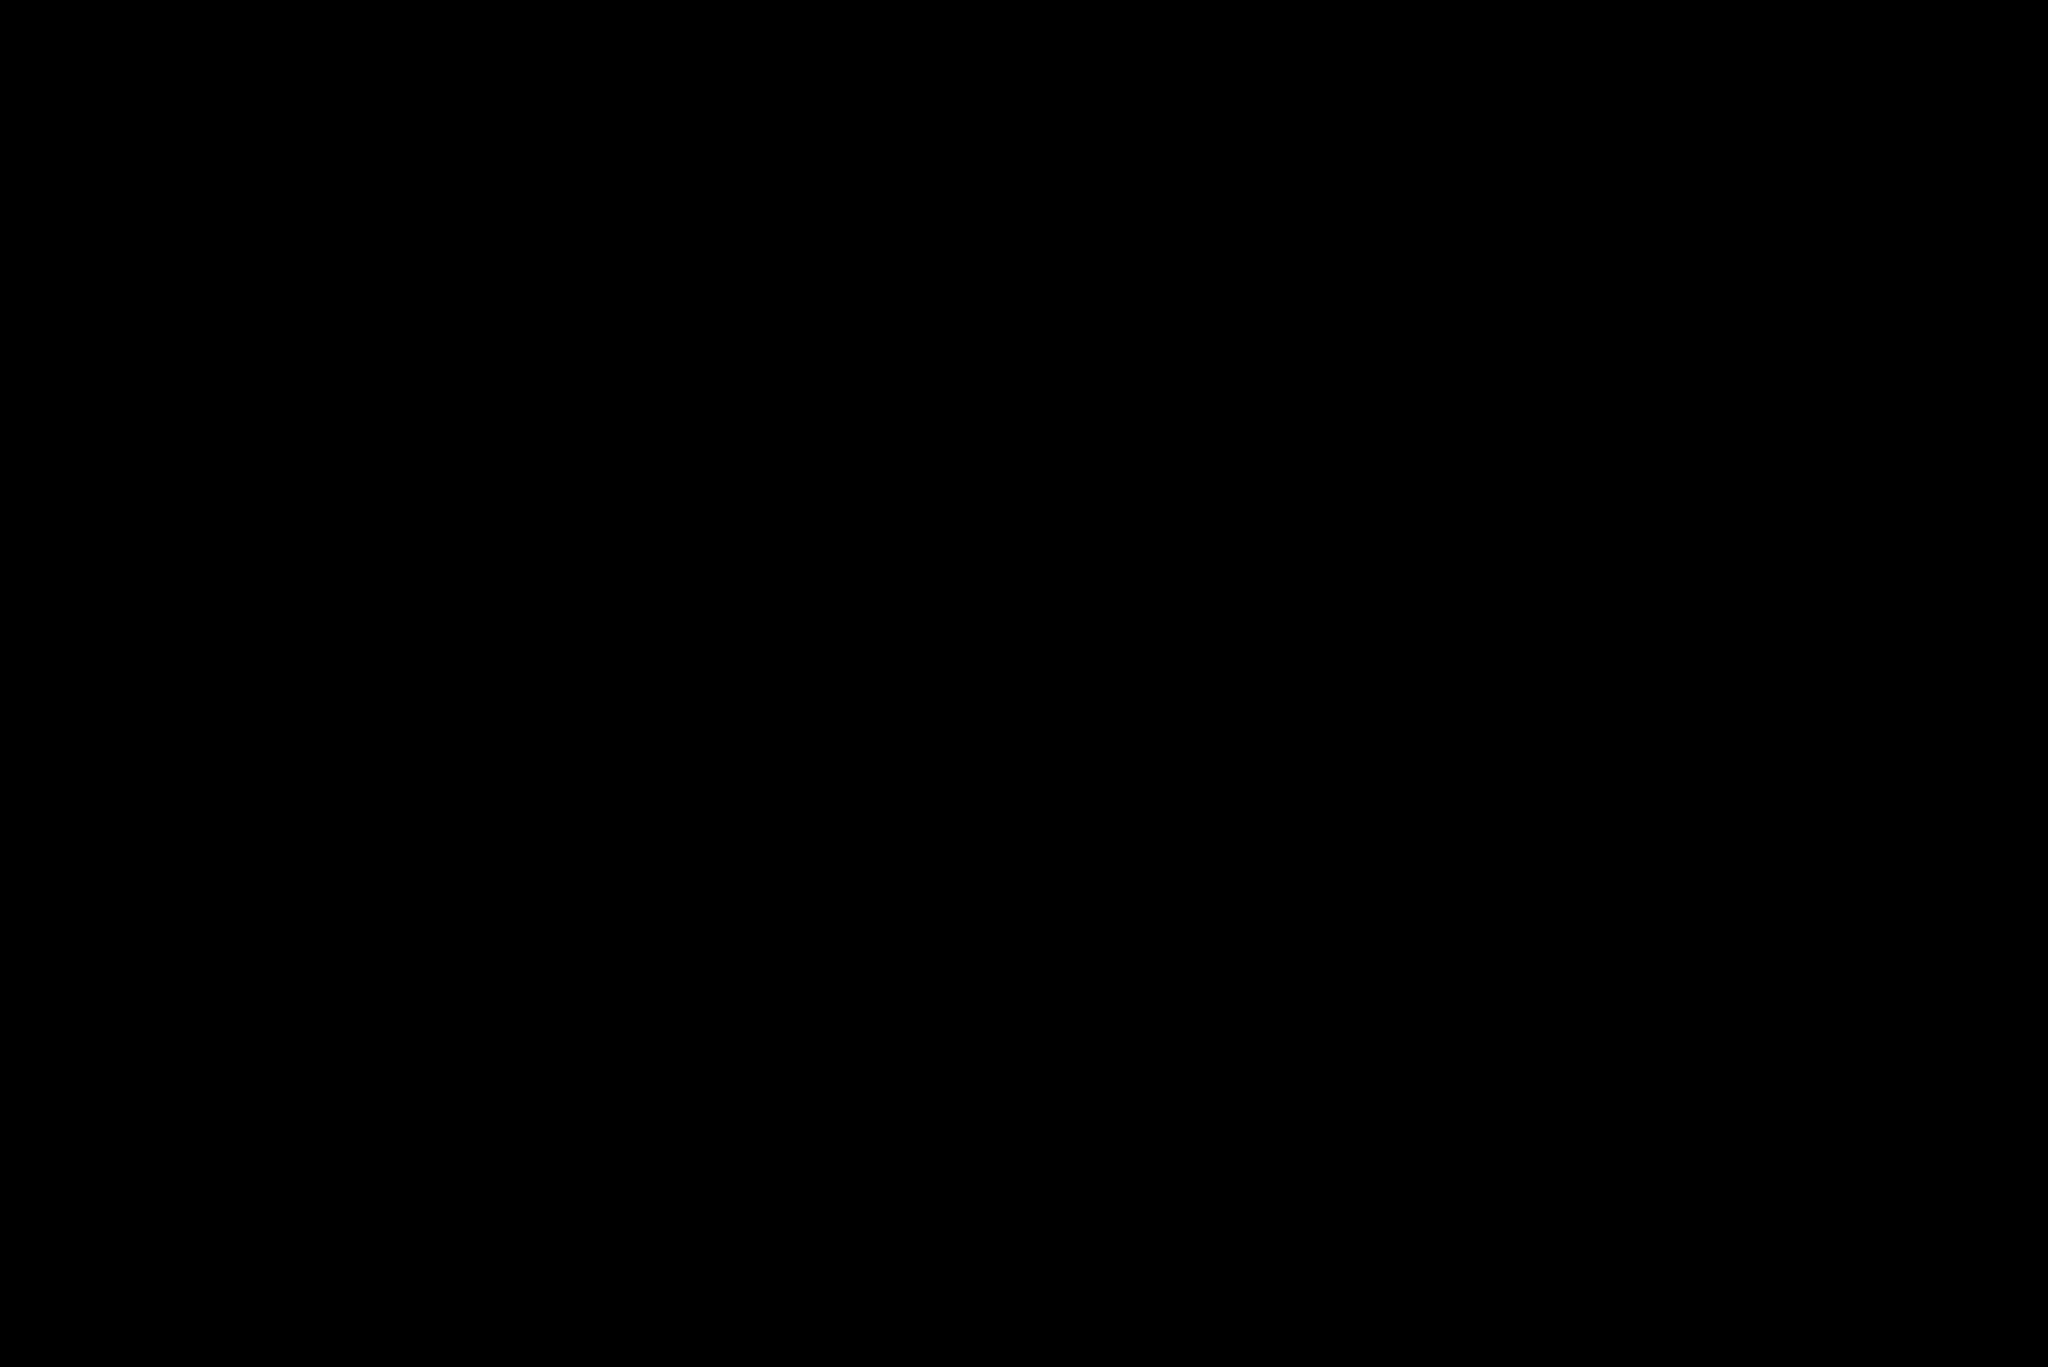 elephas olivier behra